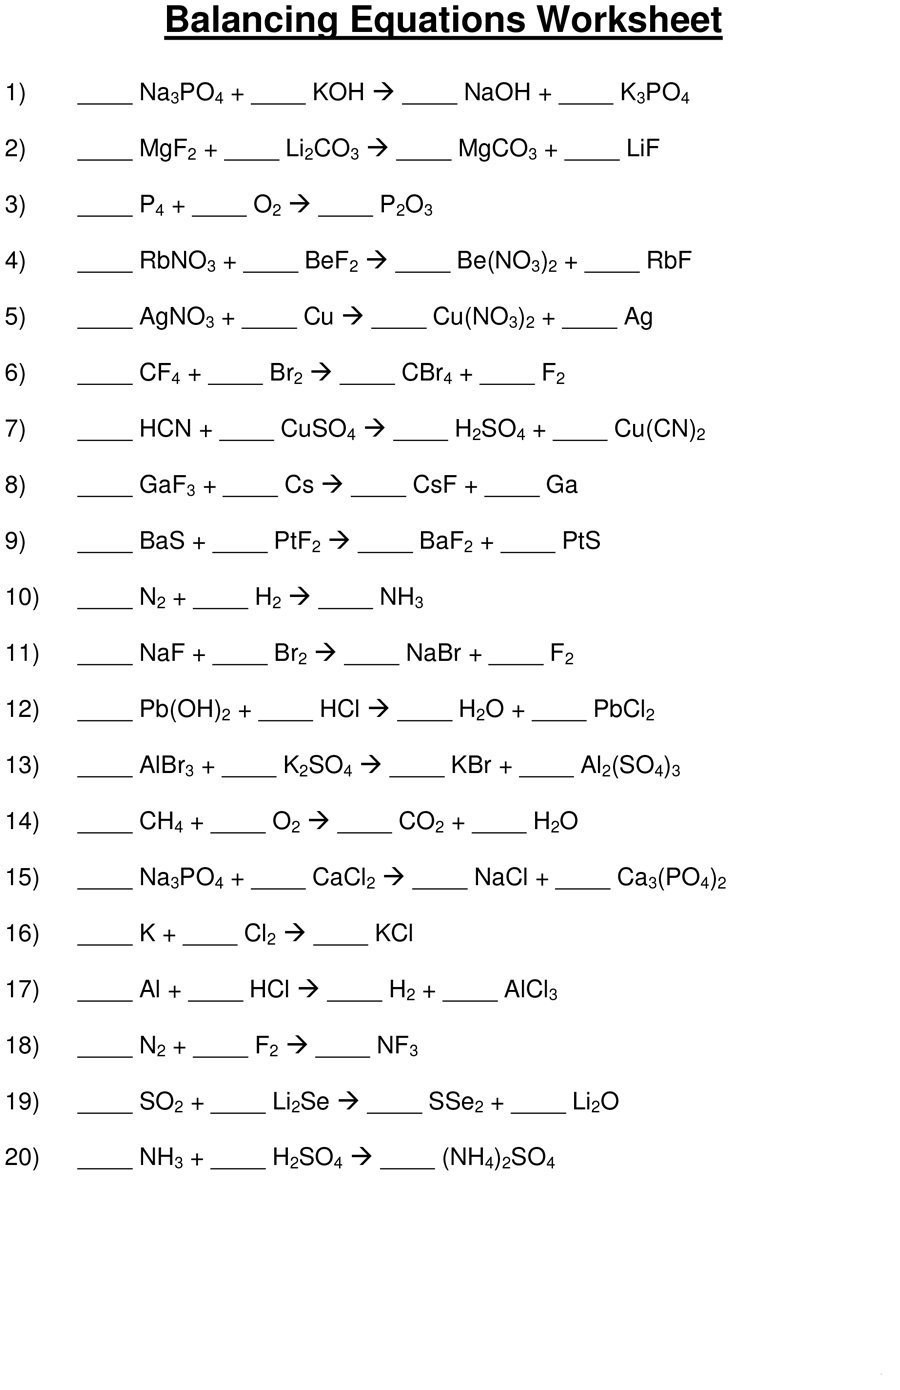 49 Balancing Chemical Equations Worksheets With Answers For Balancing Chemical Equations Worksheet Grade 10